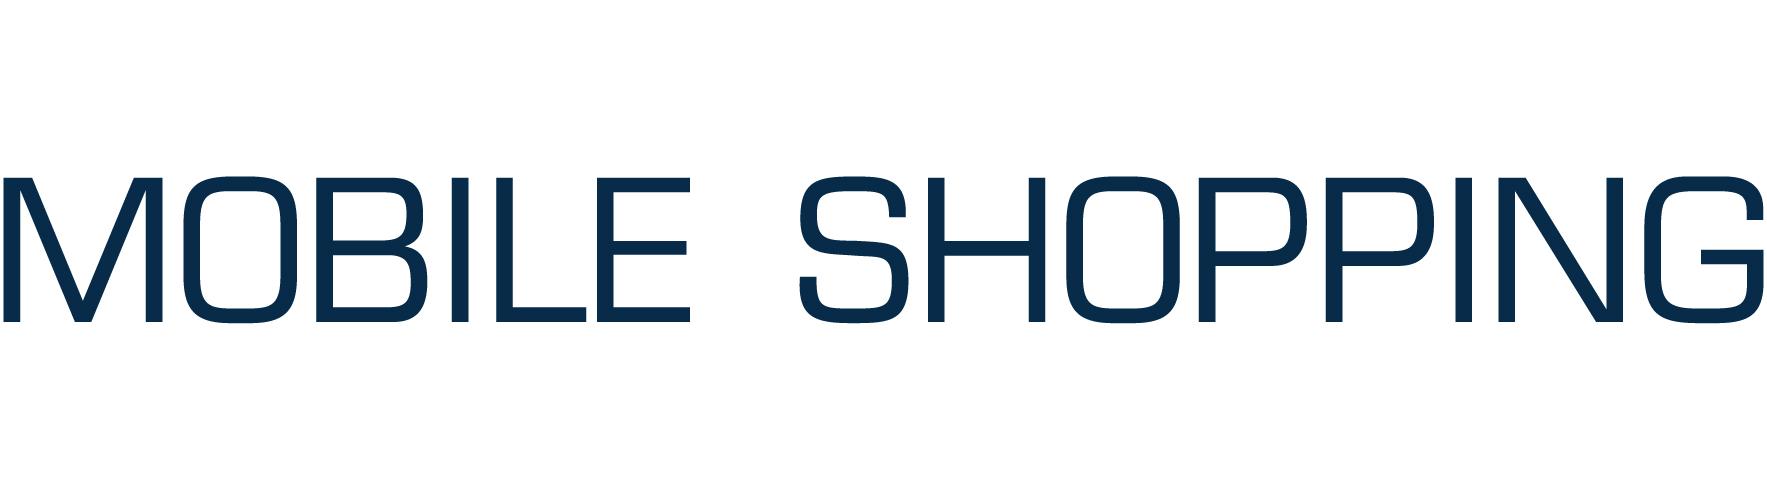 Mobile Shopping 2017